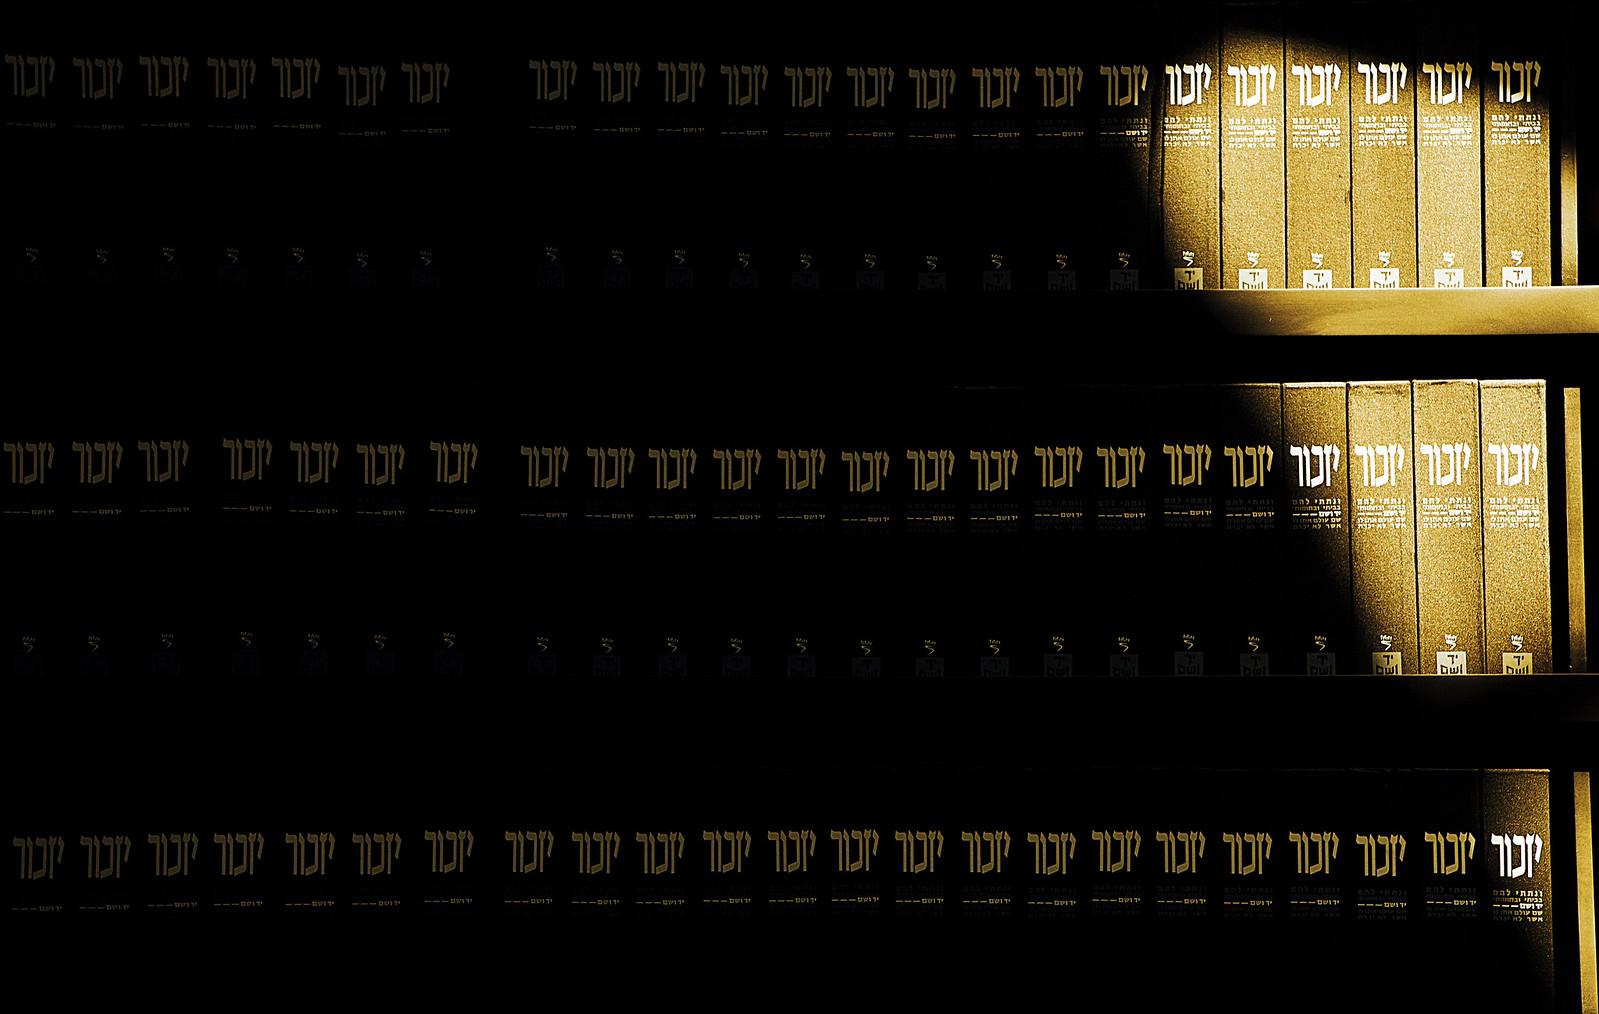 Jerusalem_Yad Vashem_the Hall of Names_3_Noam Chen_IMOT